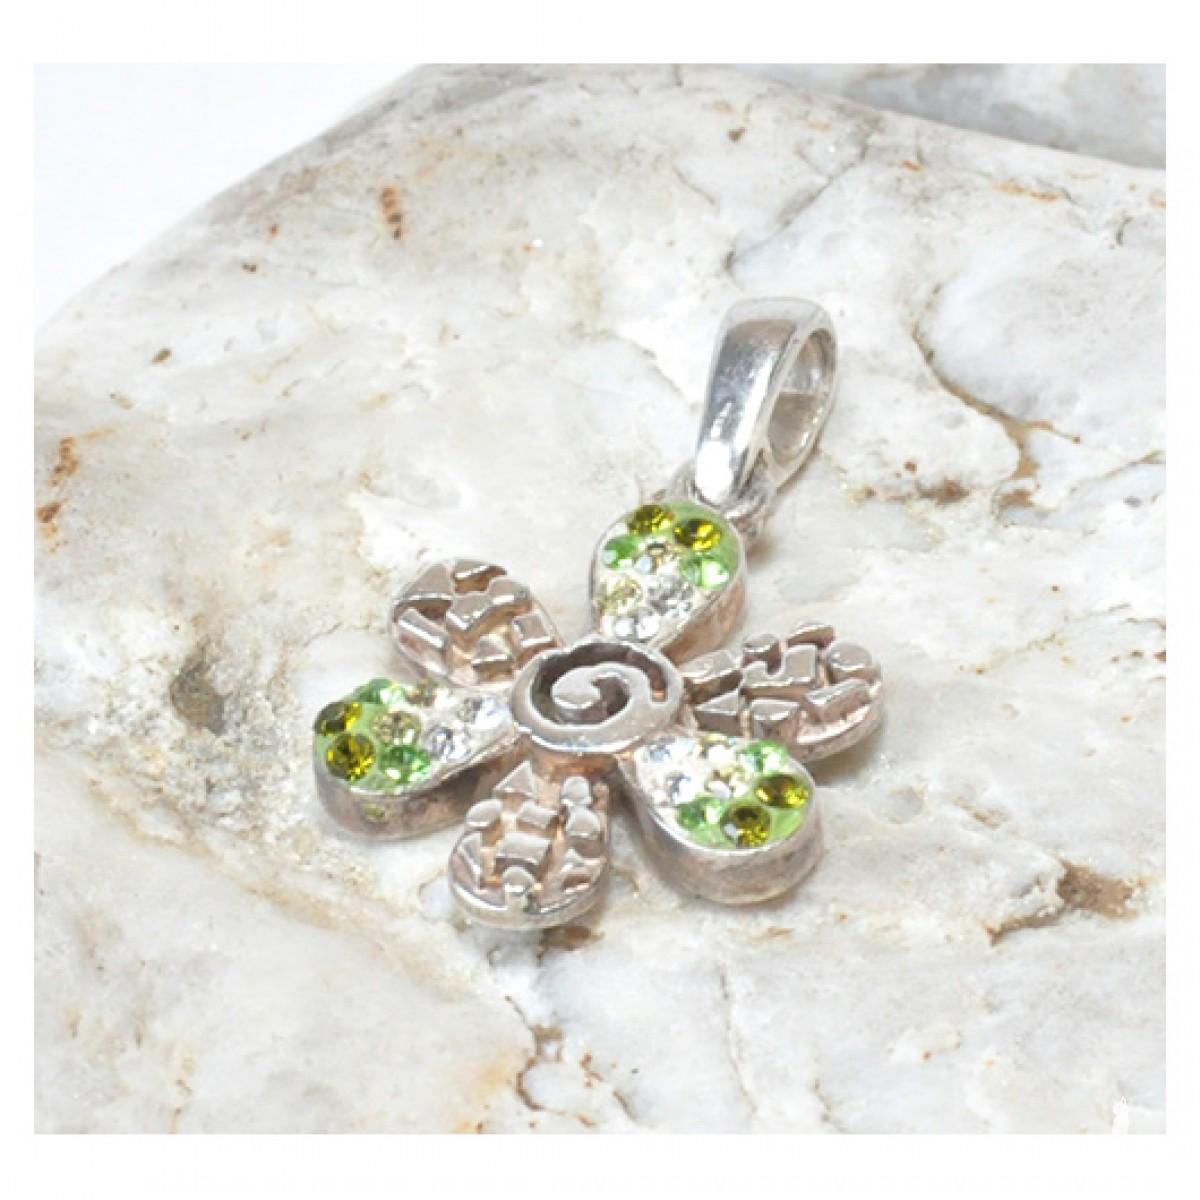 102 srebrny wisiorek, zawieszka; kwiatek, kwiatek z cyrkoniami